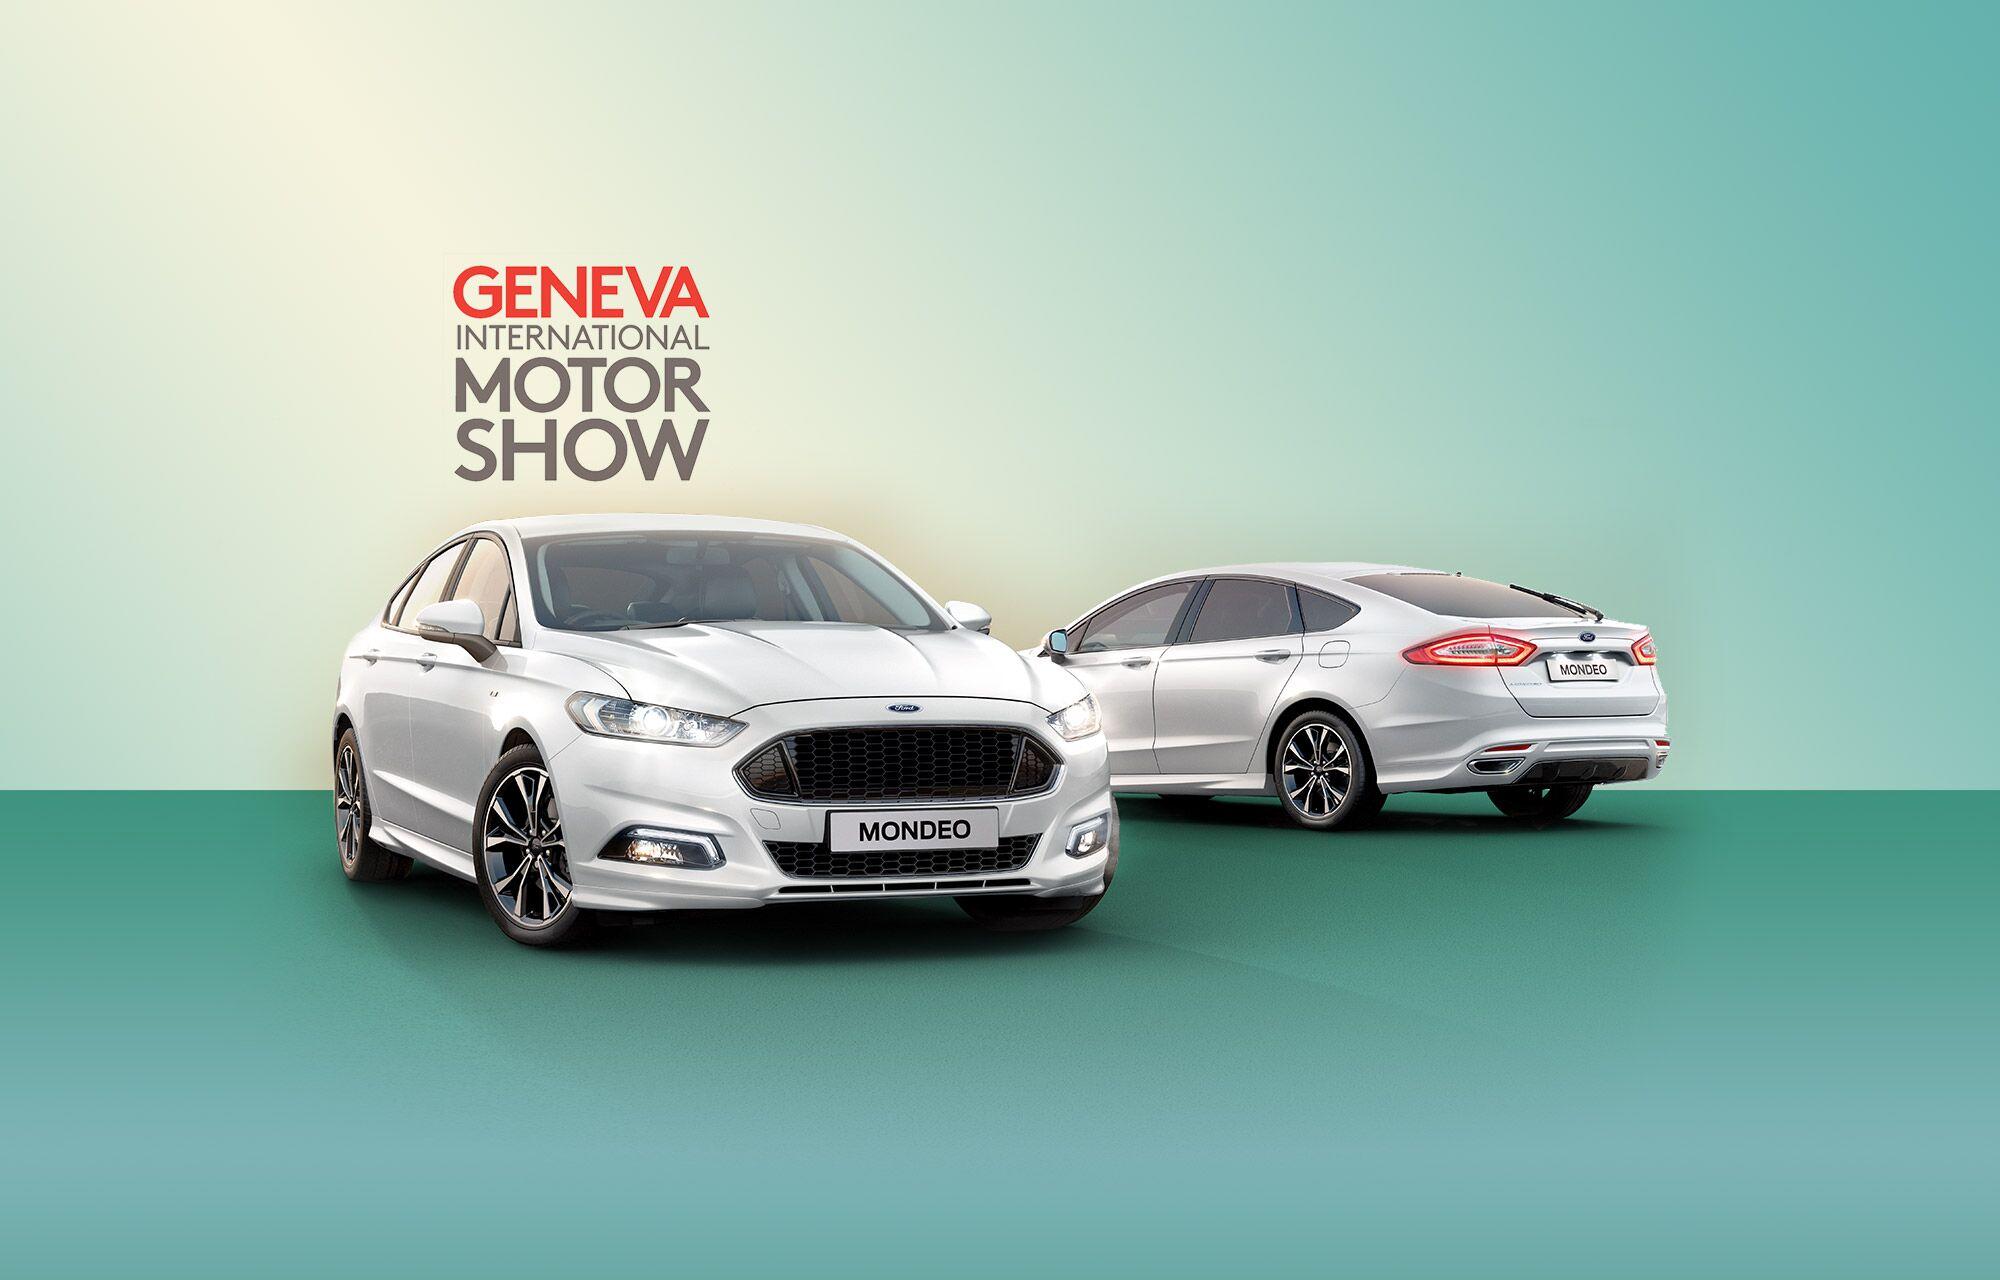 Geneva International Motorshow